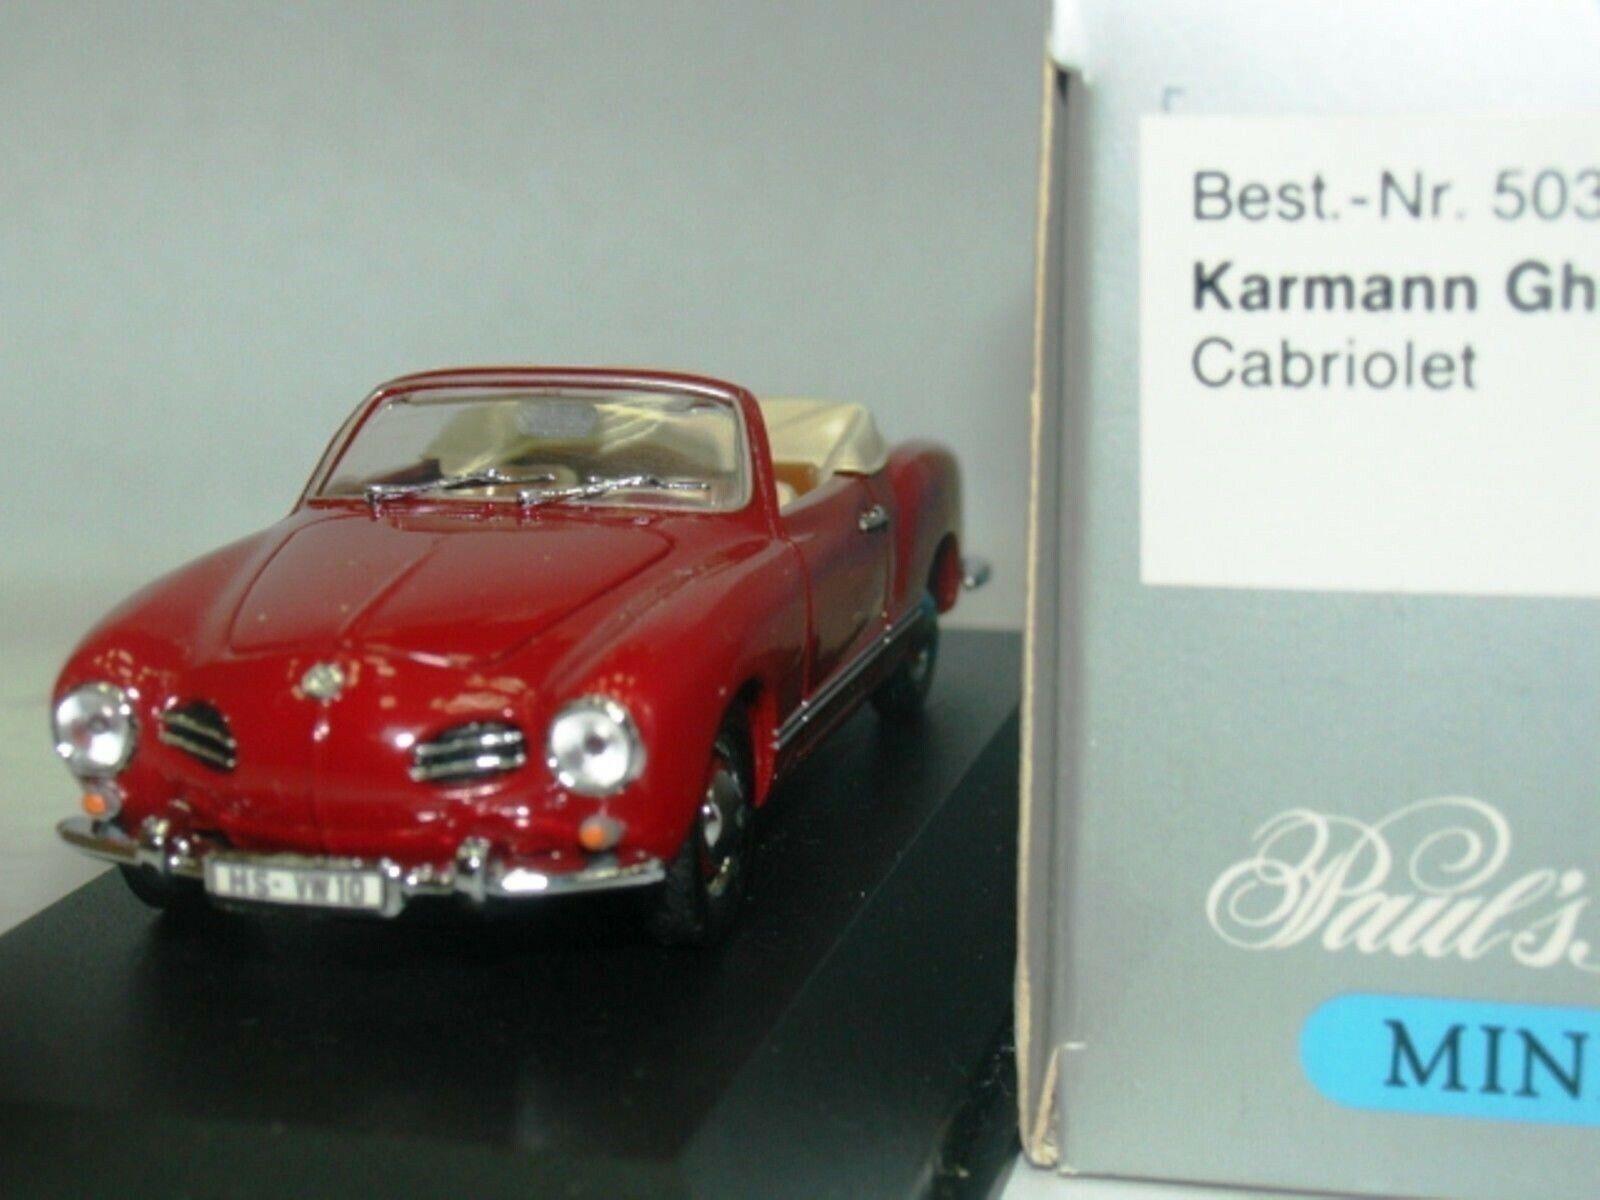 WOW estremamente raro VW Karmann Ghia T141 cabriiolet 1957 IND rojo 1 43 Minichamps